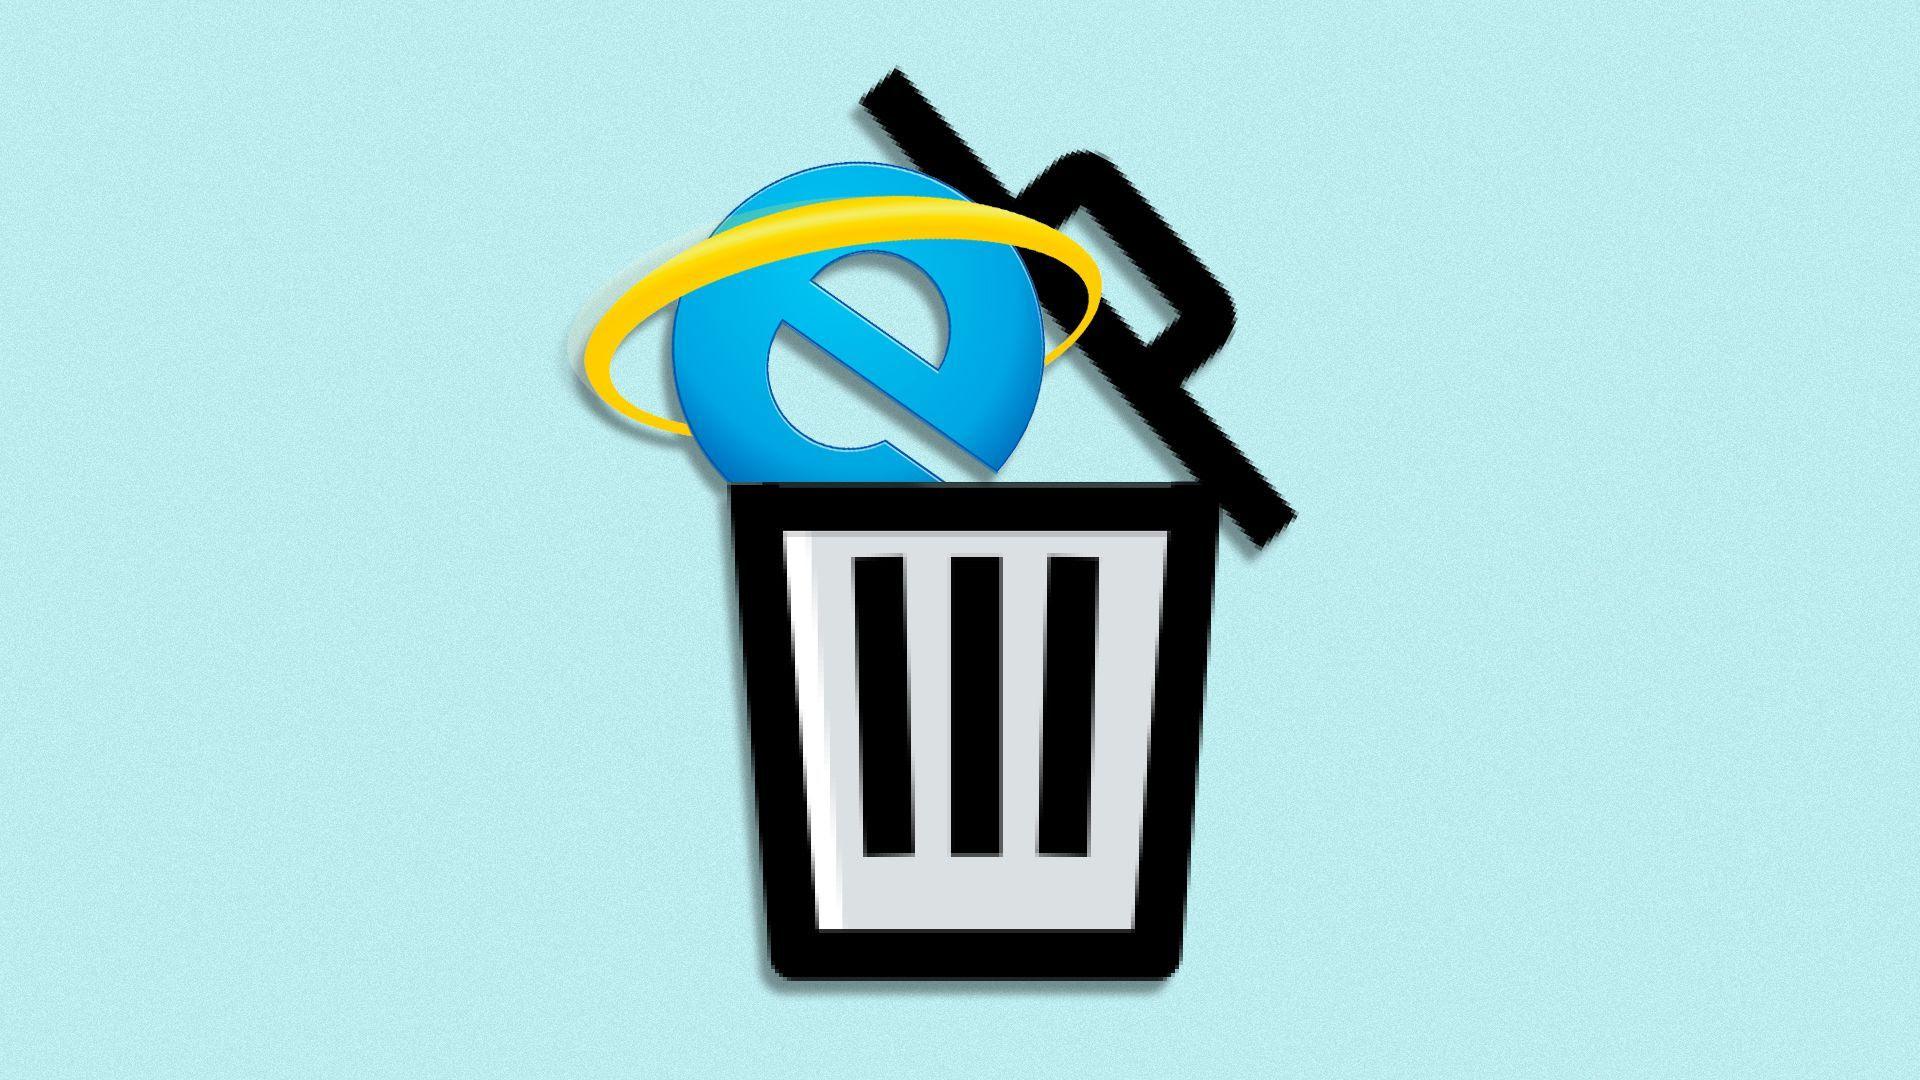 Illustration of the Internet Explorer logo in a trash icon